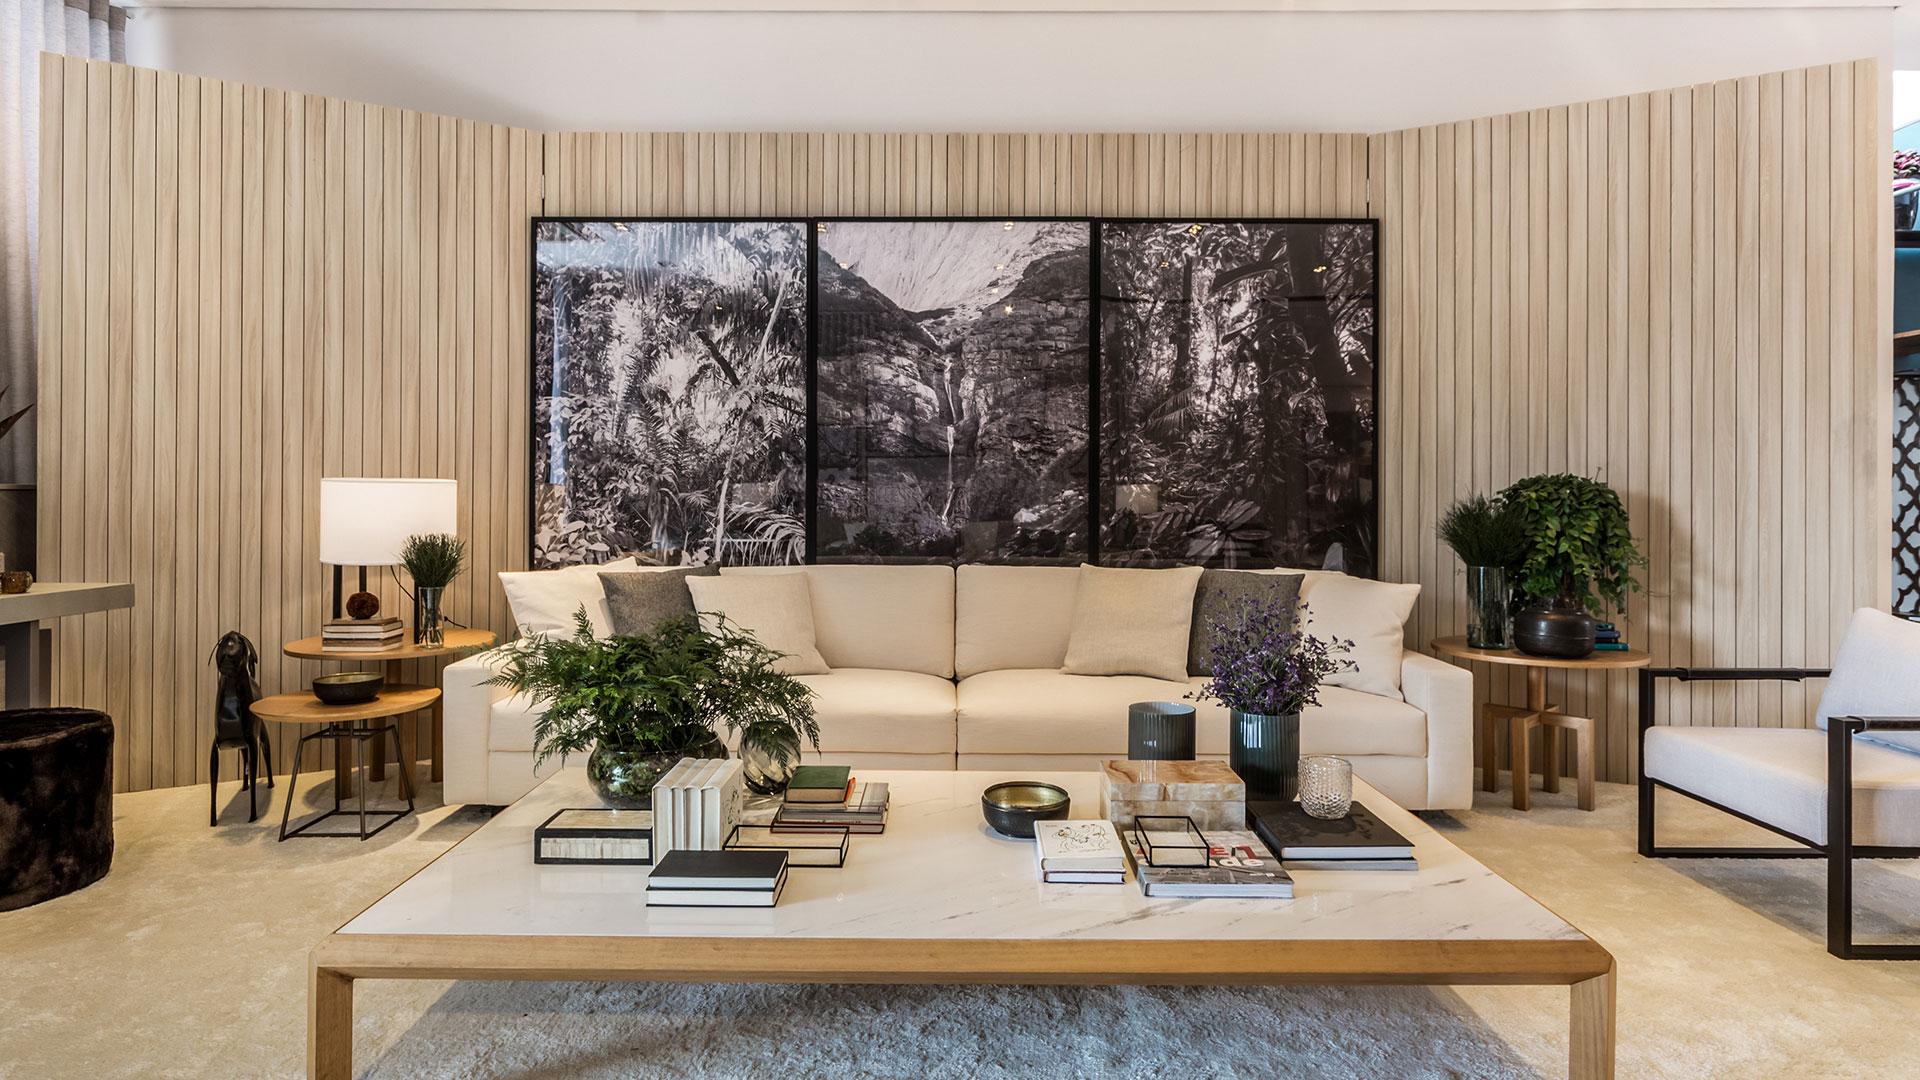 Dunelli 2017 – Casa da montanha